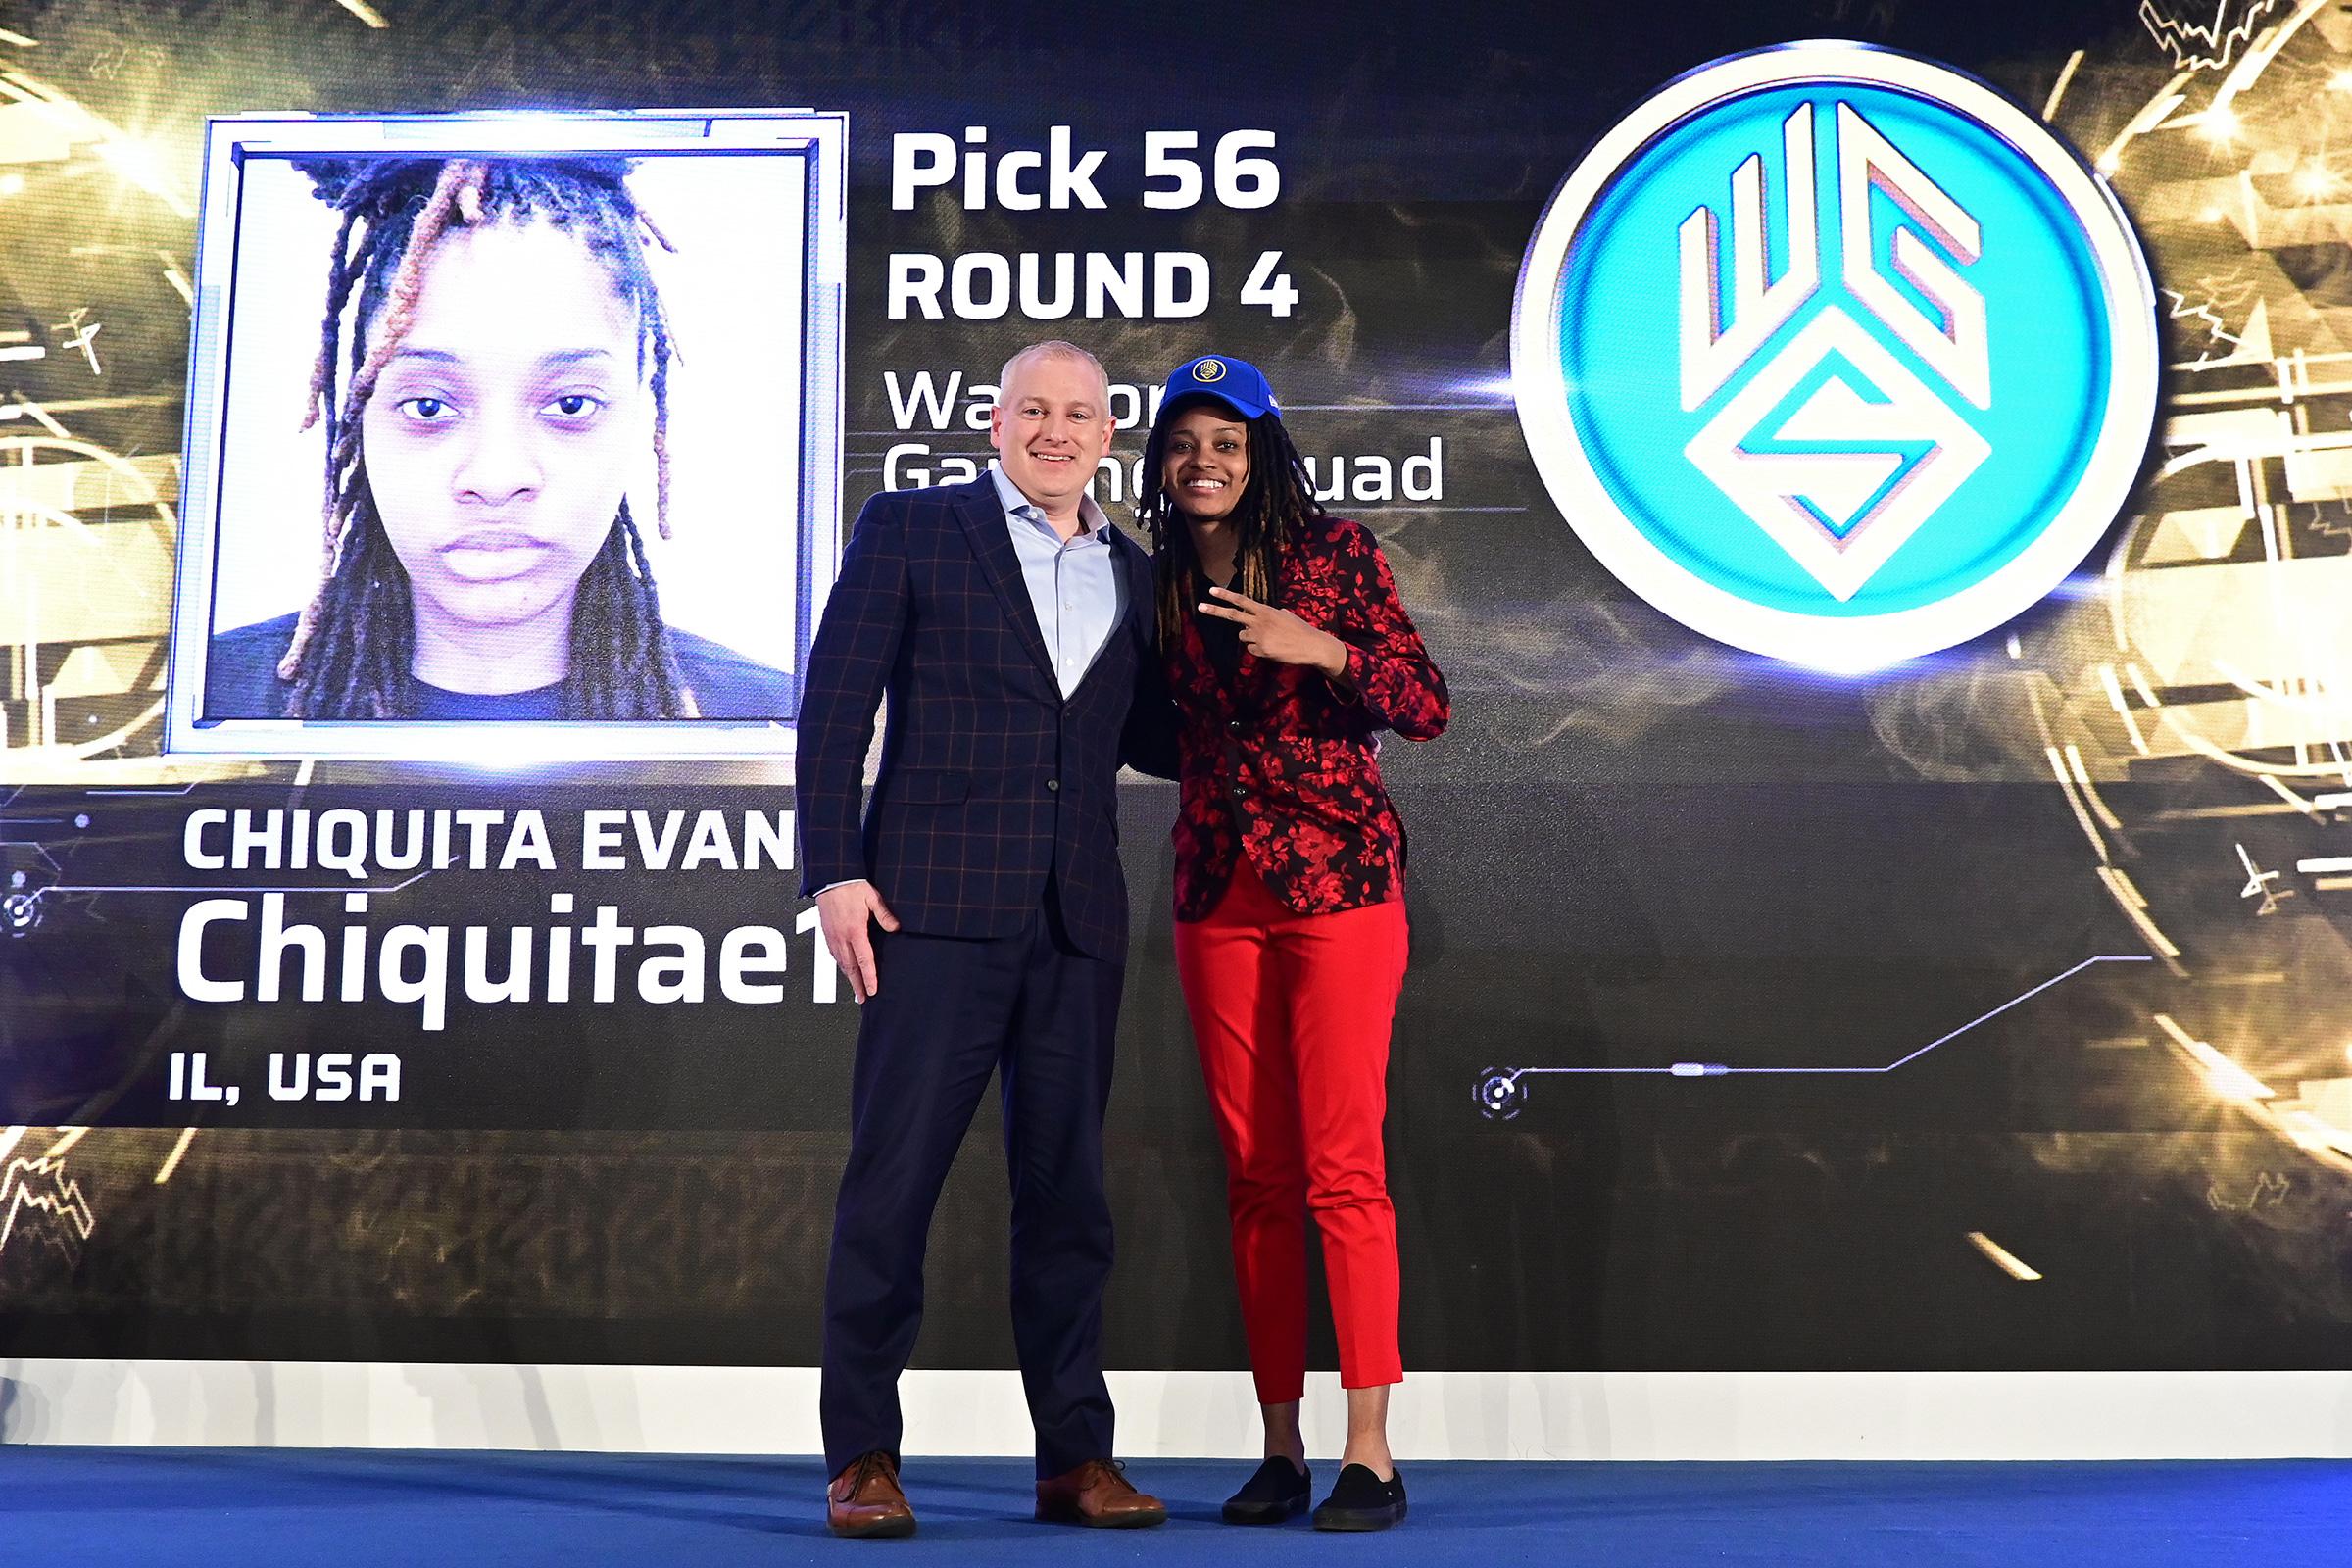 NBA 2K League managing director Brendan Donohue poses with Chiquita 'Chiquitae126' Evans at the 2019 draft